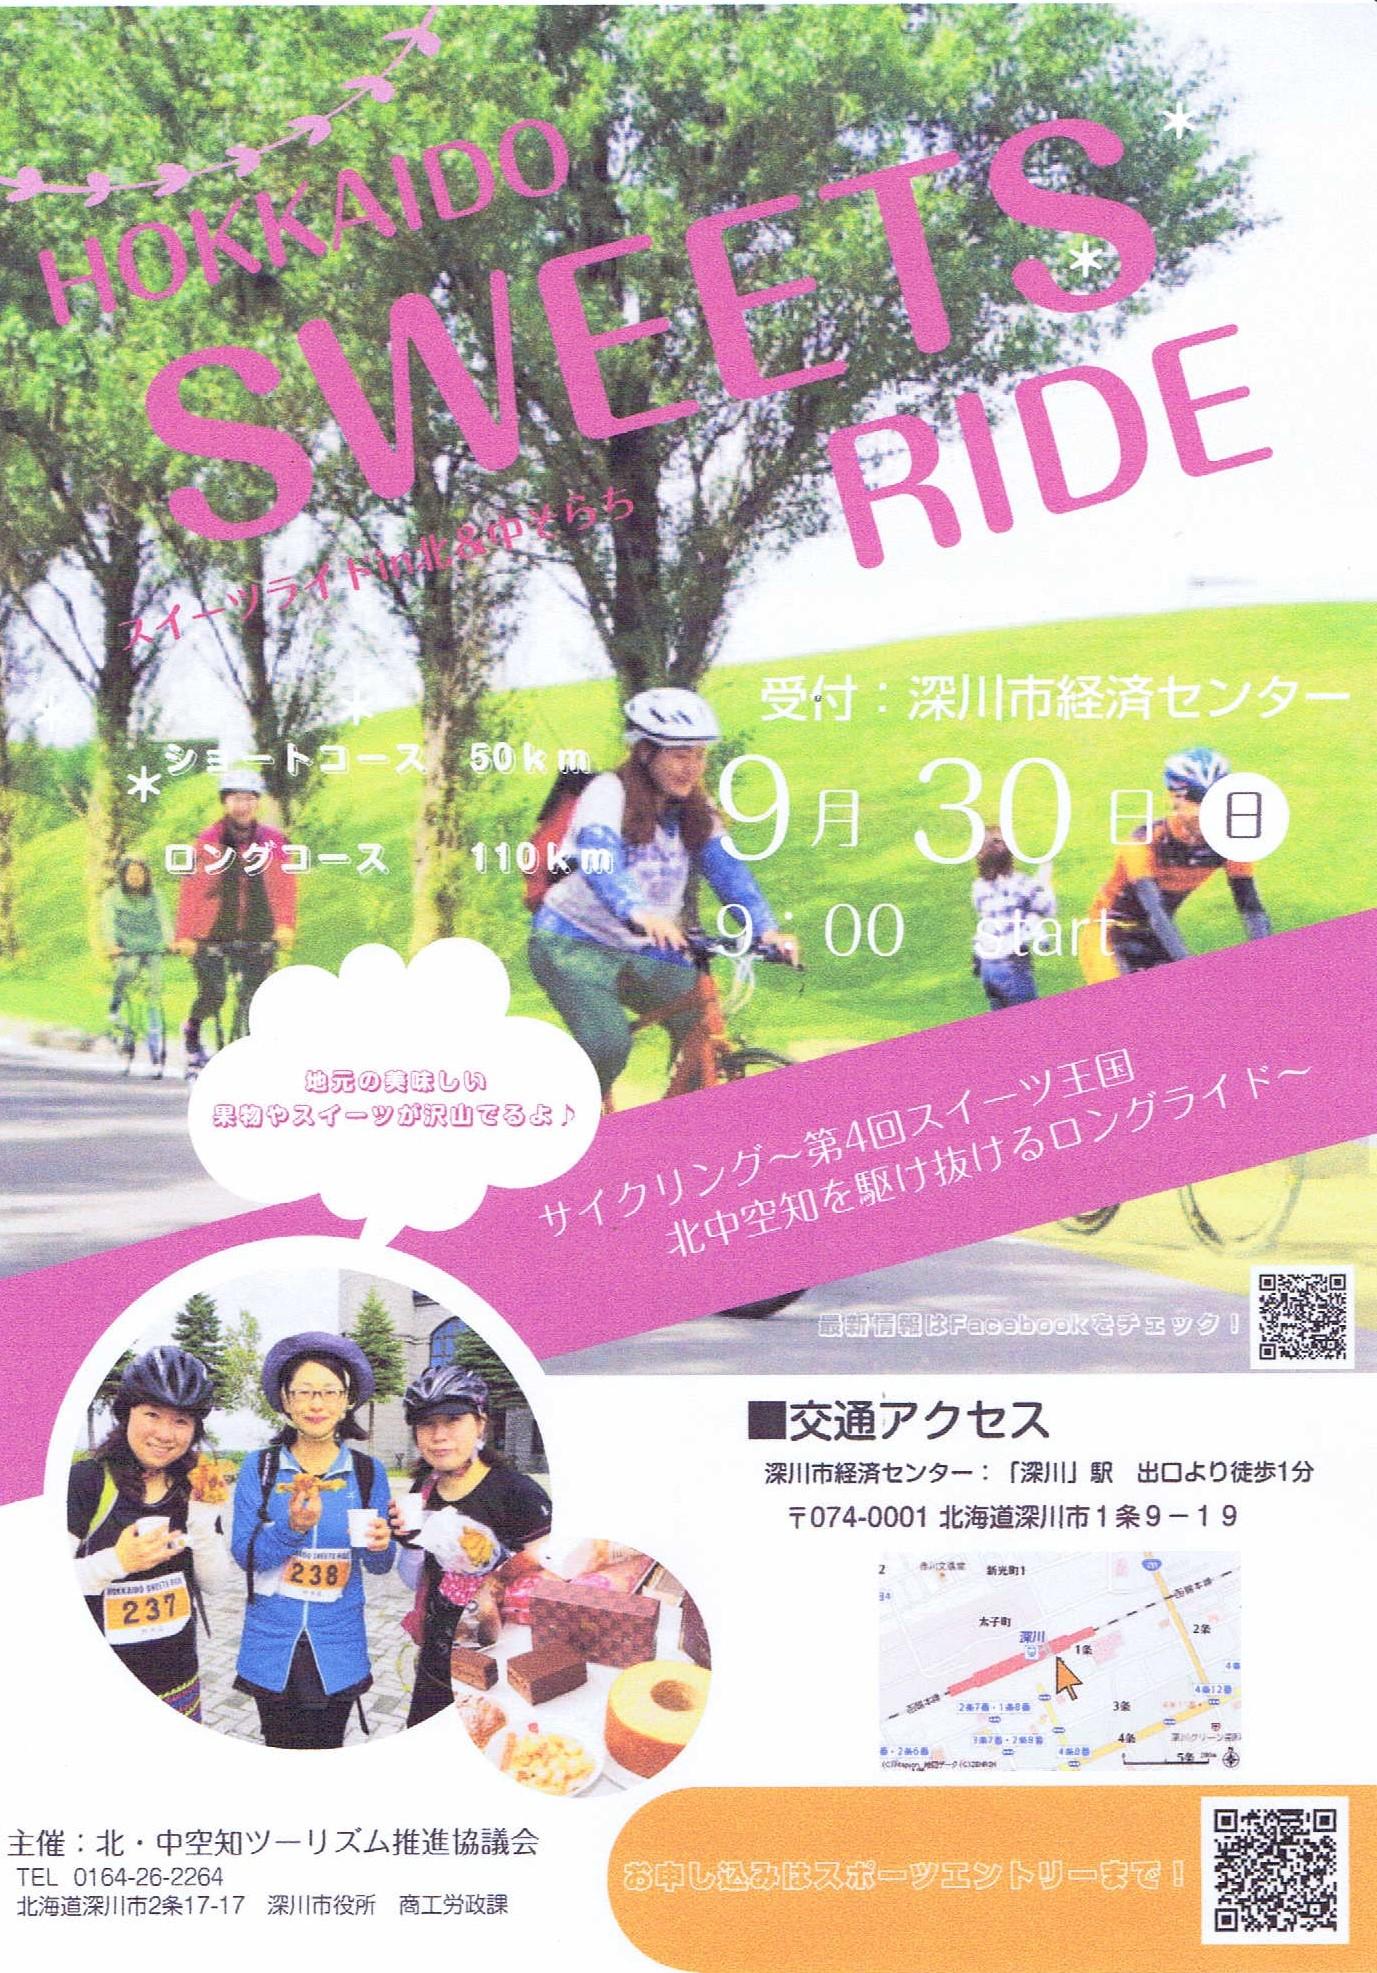 HOKKAIDO SWEETS RIDE スイーツライドin北&中そらちのポスター